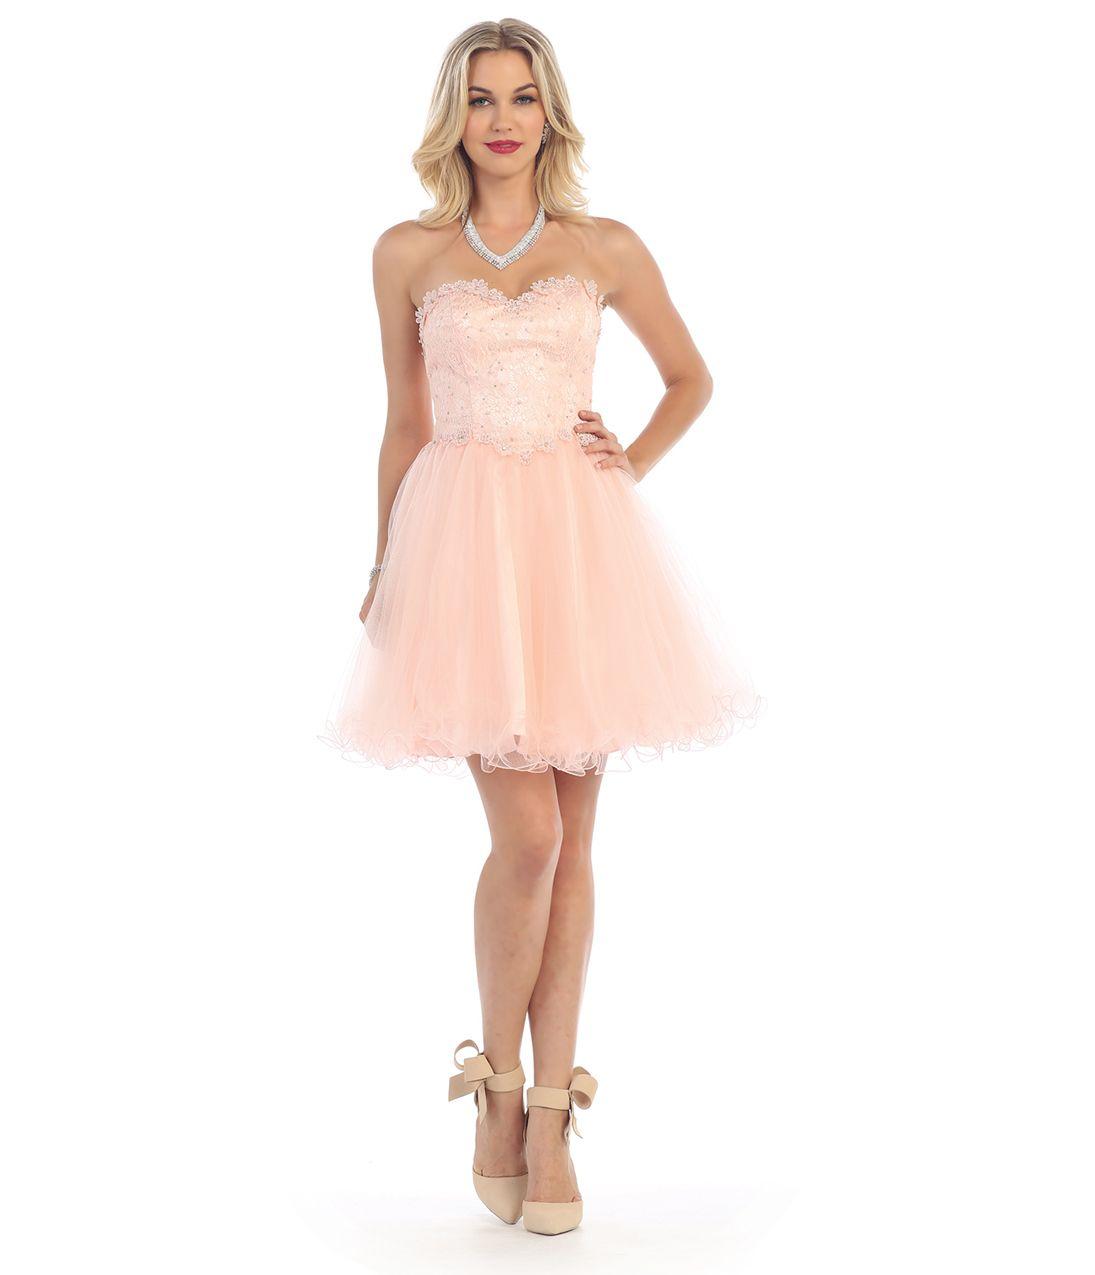 Blush pink strapless embellished sweetheart tulle short